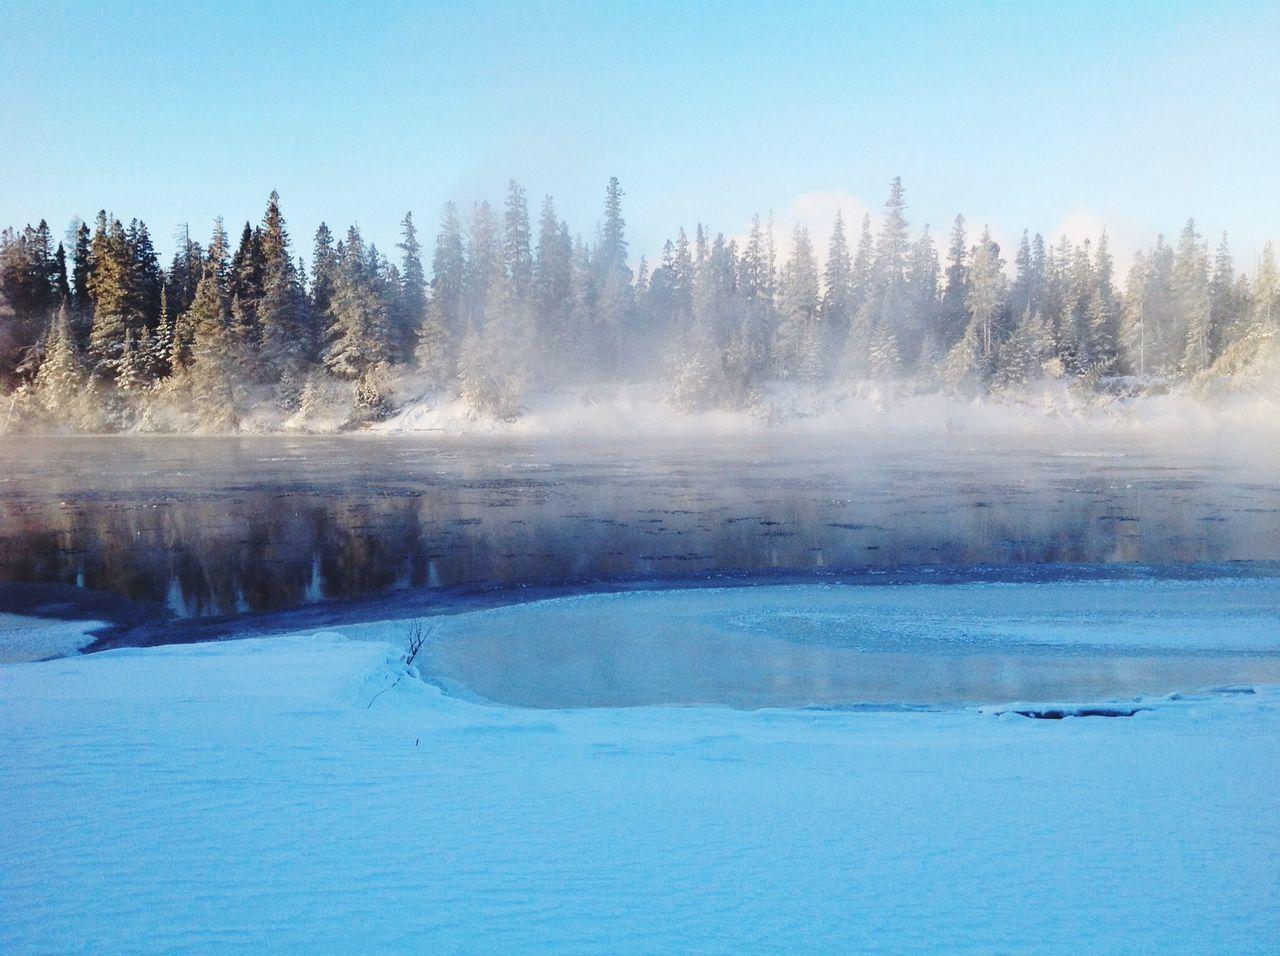 Early morning river scene.